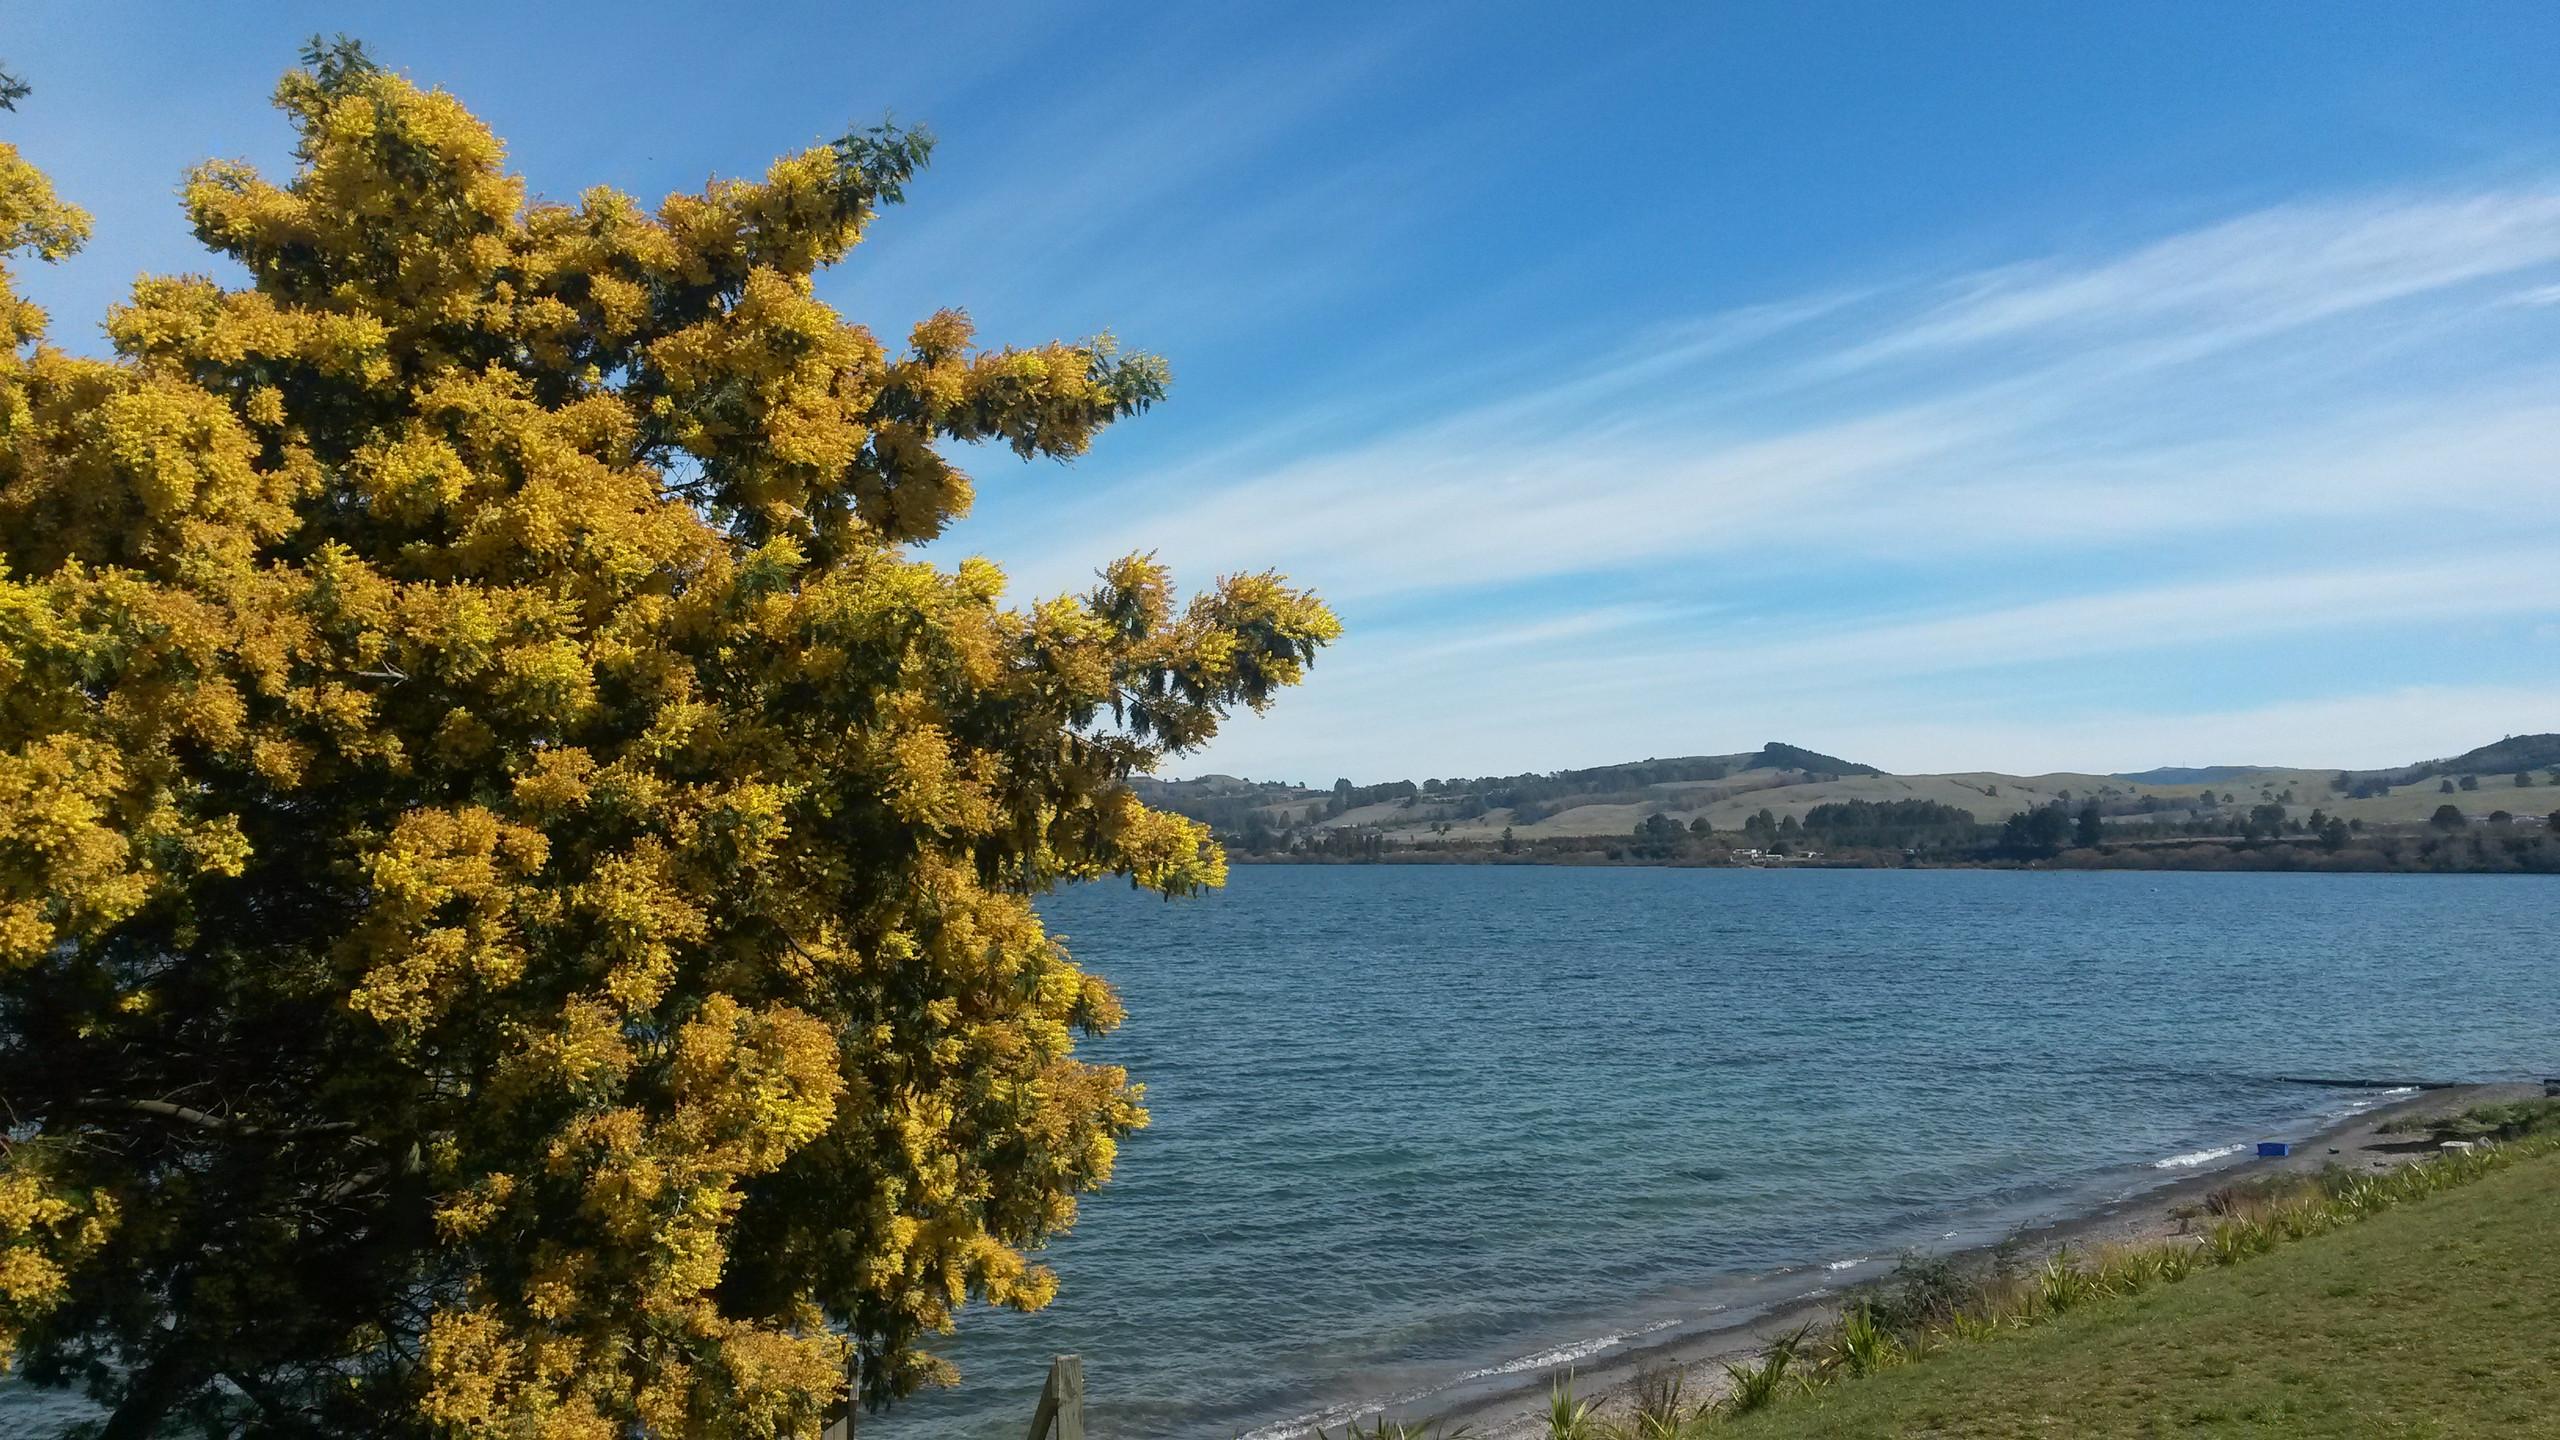 Lake Taupo New Zealand, New Zealand activities, New Zealand attractions